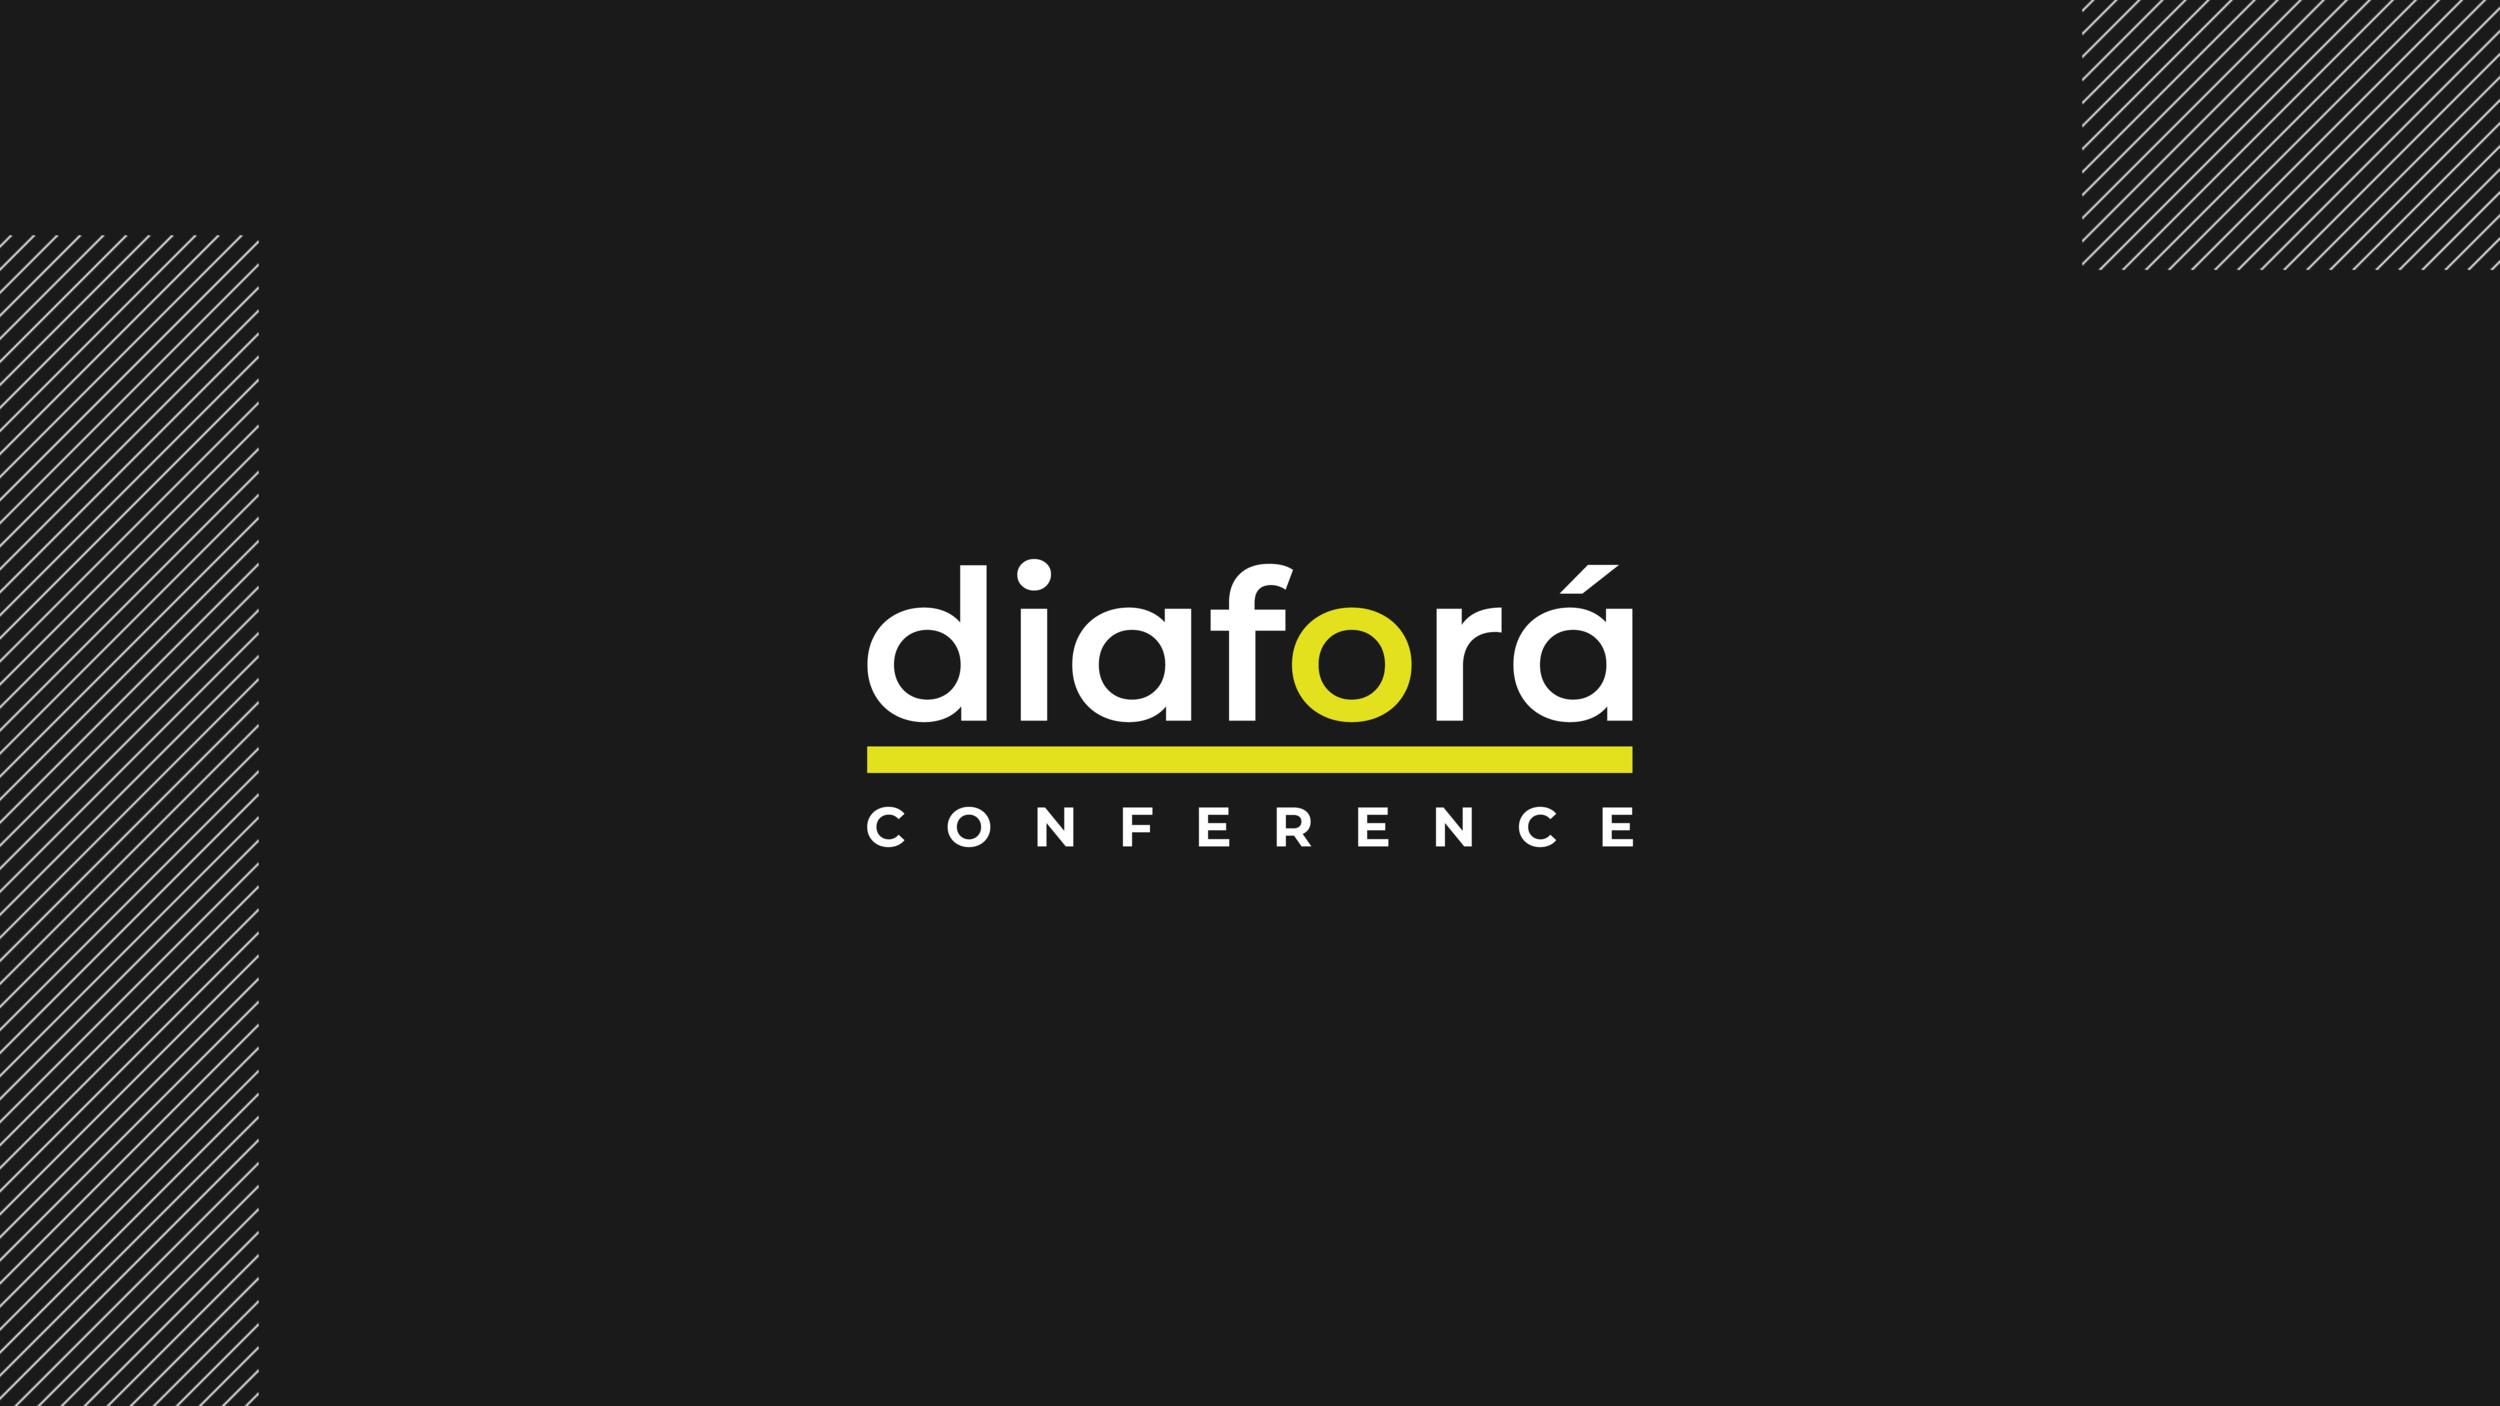 Diafora Confrence banner 1.png